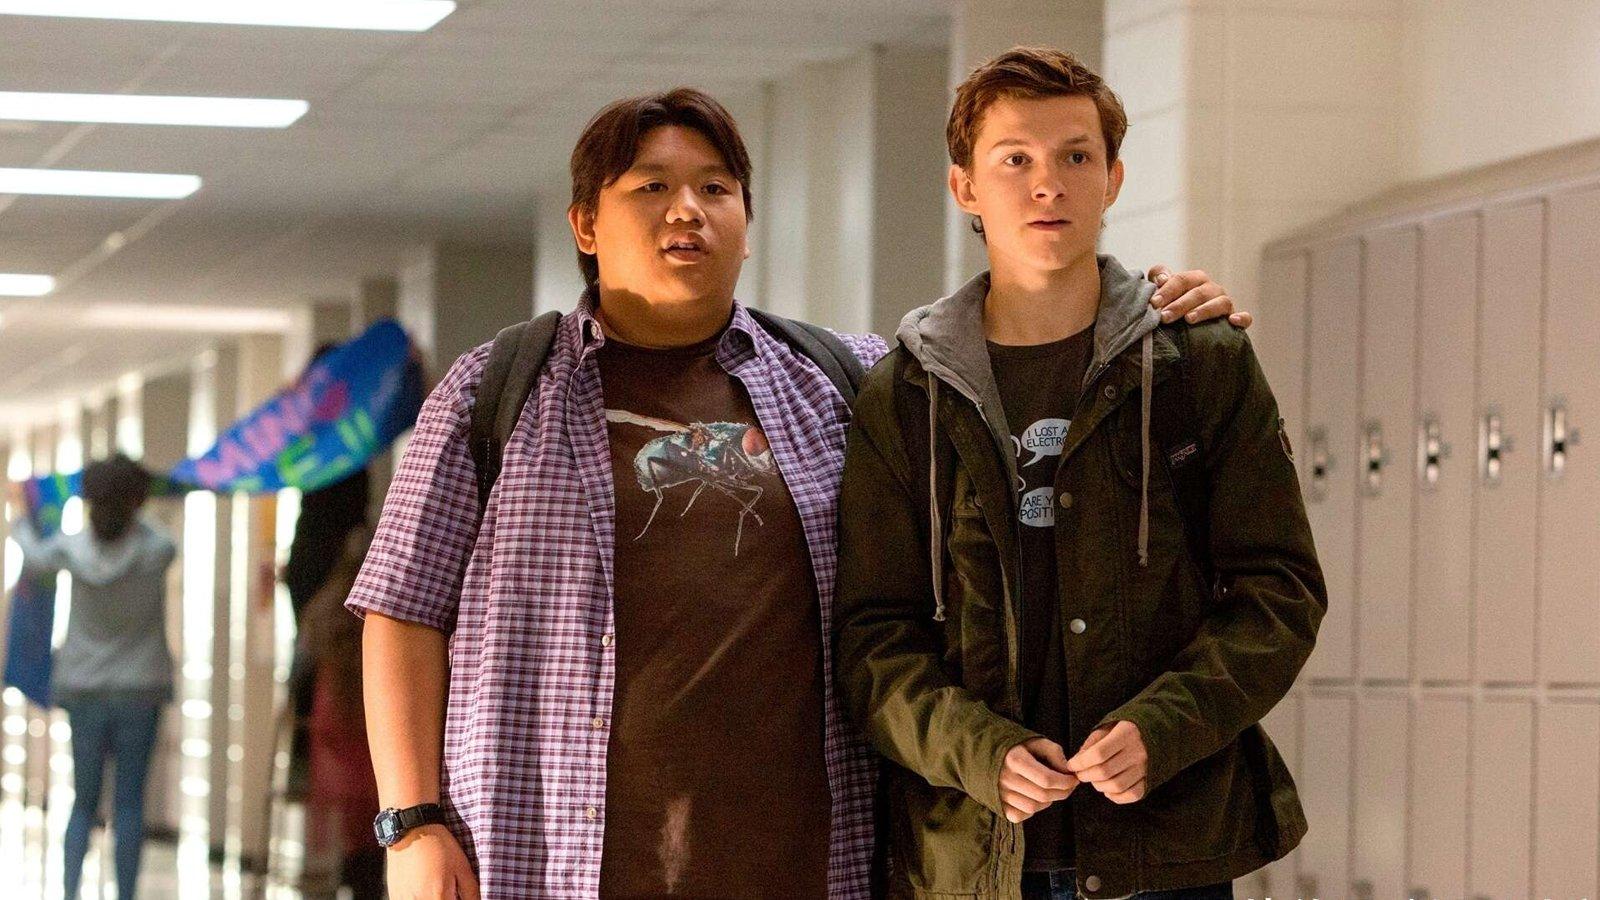 Spider Man Tom Holland and Jacob Batalon Bromance